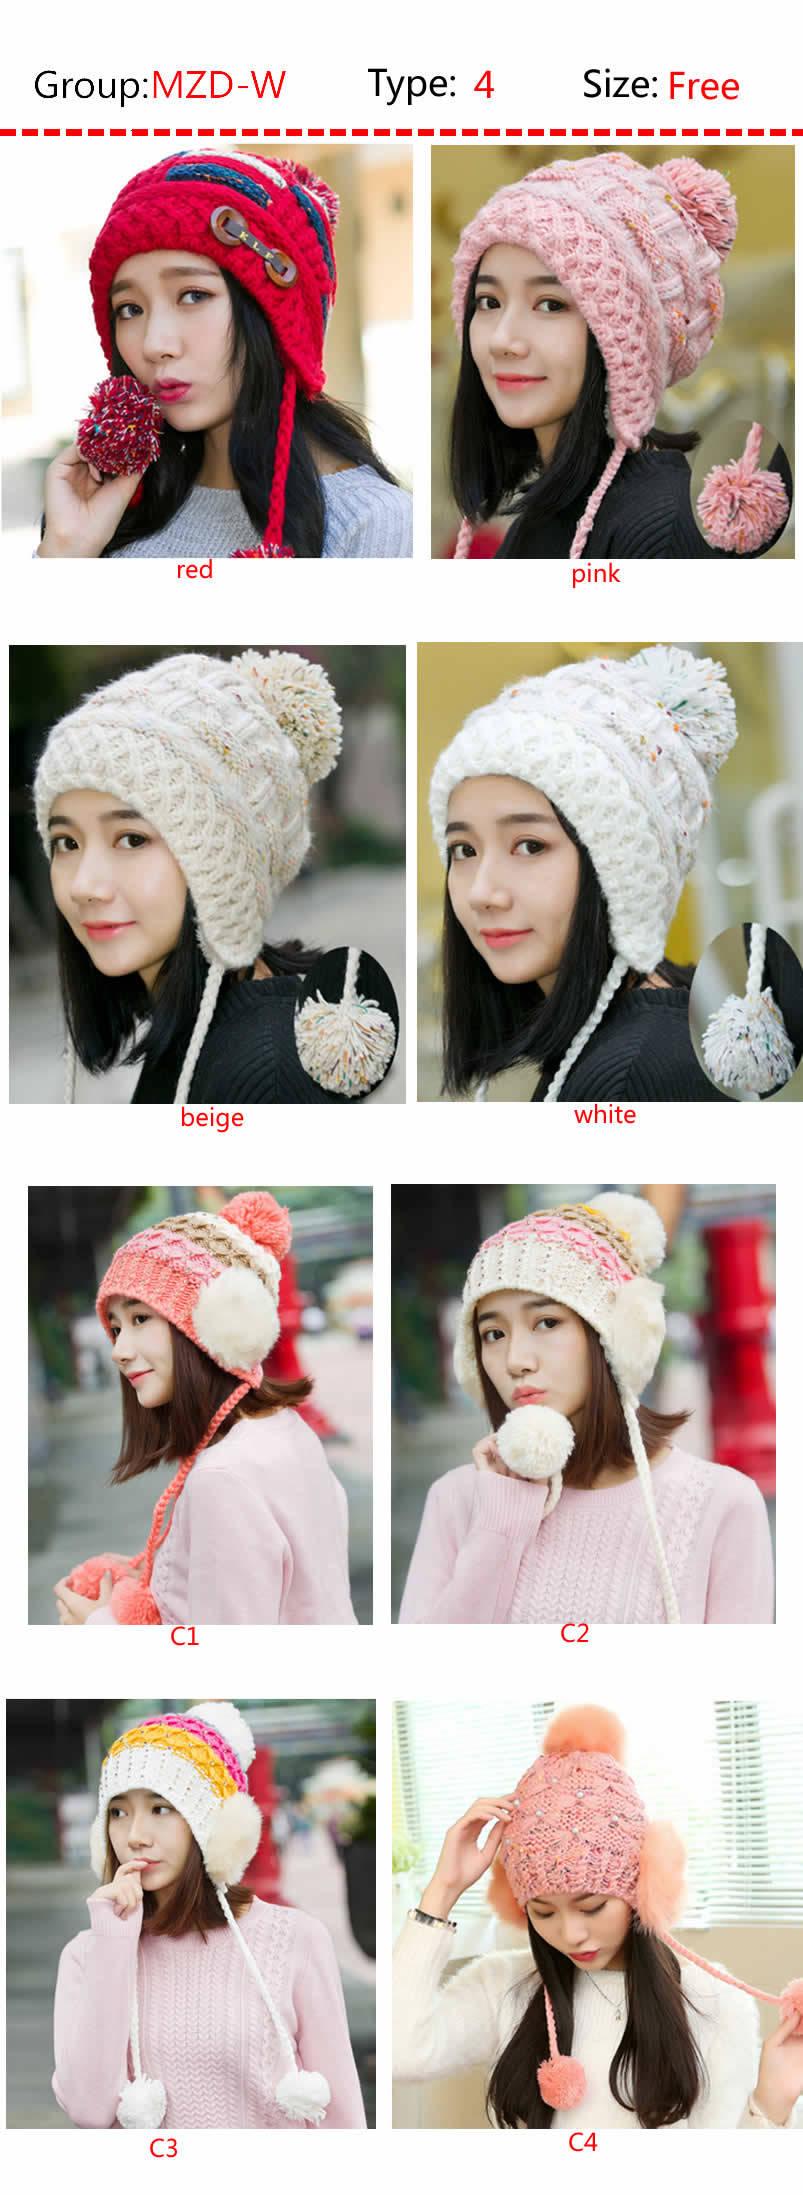 b59313502 men/women/kids/baby winter scarf caps Hat socks gloves outdoor Knitted hats  Muffler gloves Warmth